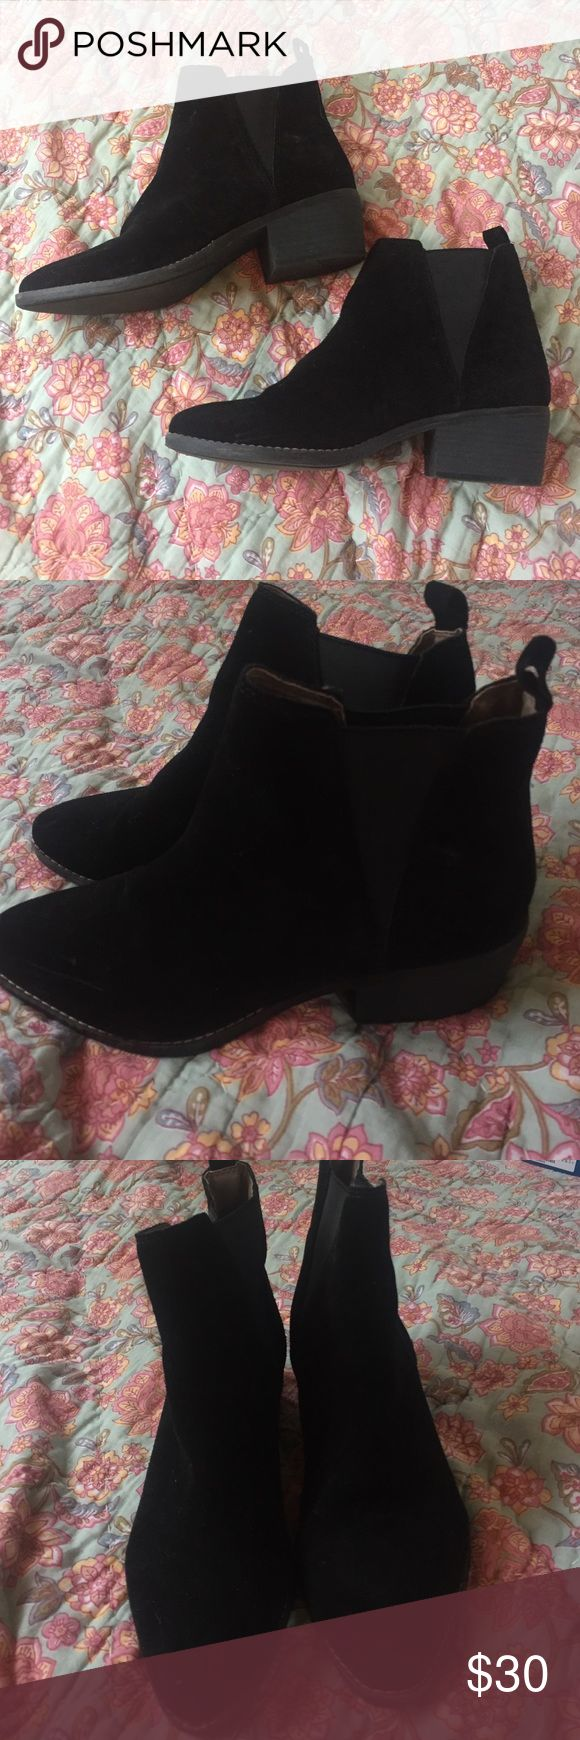 Black Booties White Mountain brand, never worn white mountain Shoes Ankle Boots & Booties